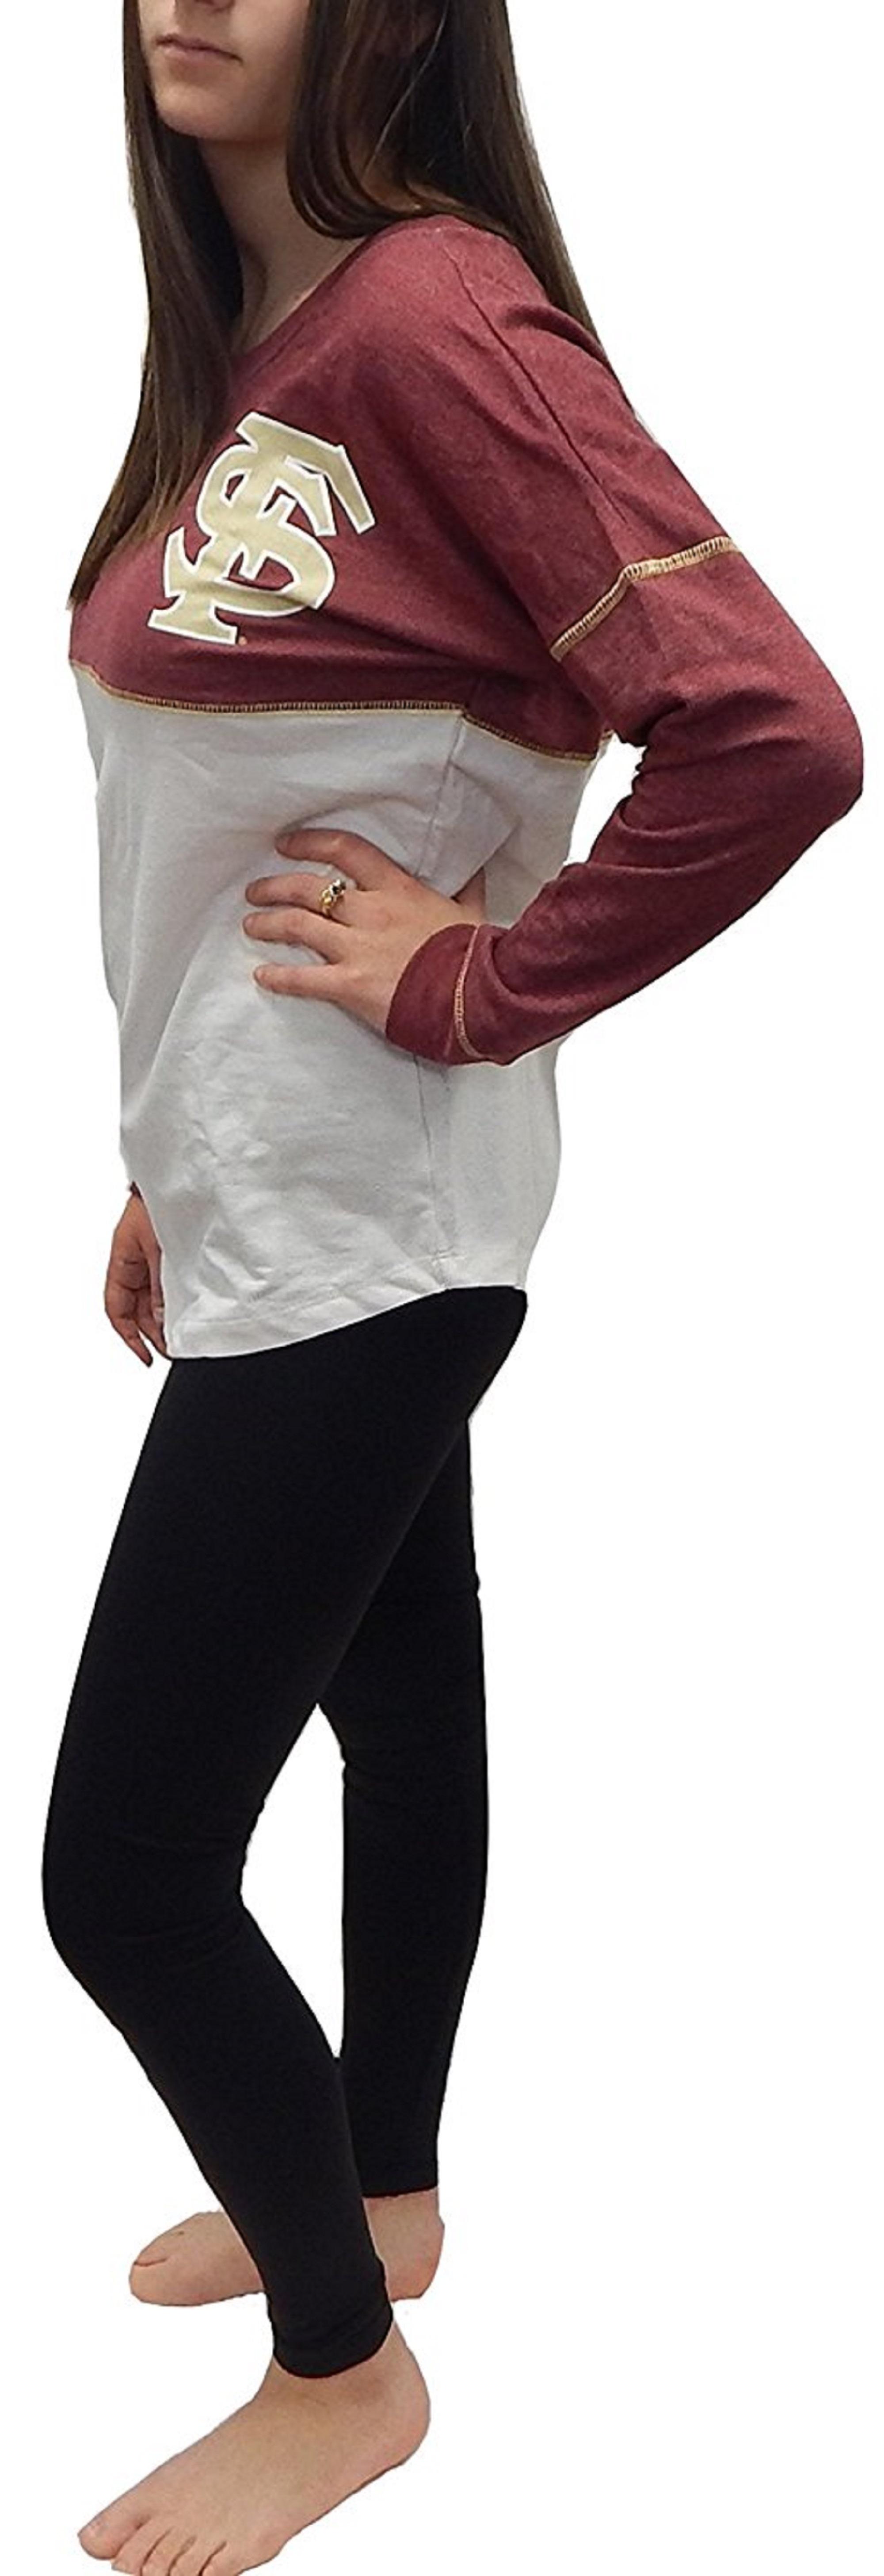 Florida State FSU Seminoles Officially Licensed Logo Junior Fit Drop Yoke Tee French Terry Long Sleeve T-Shirt (Medium) by Recylced Karma University